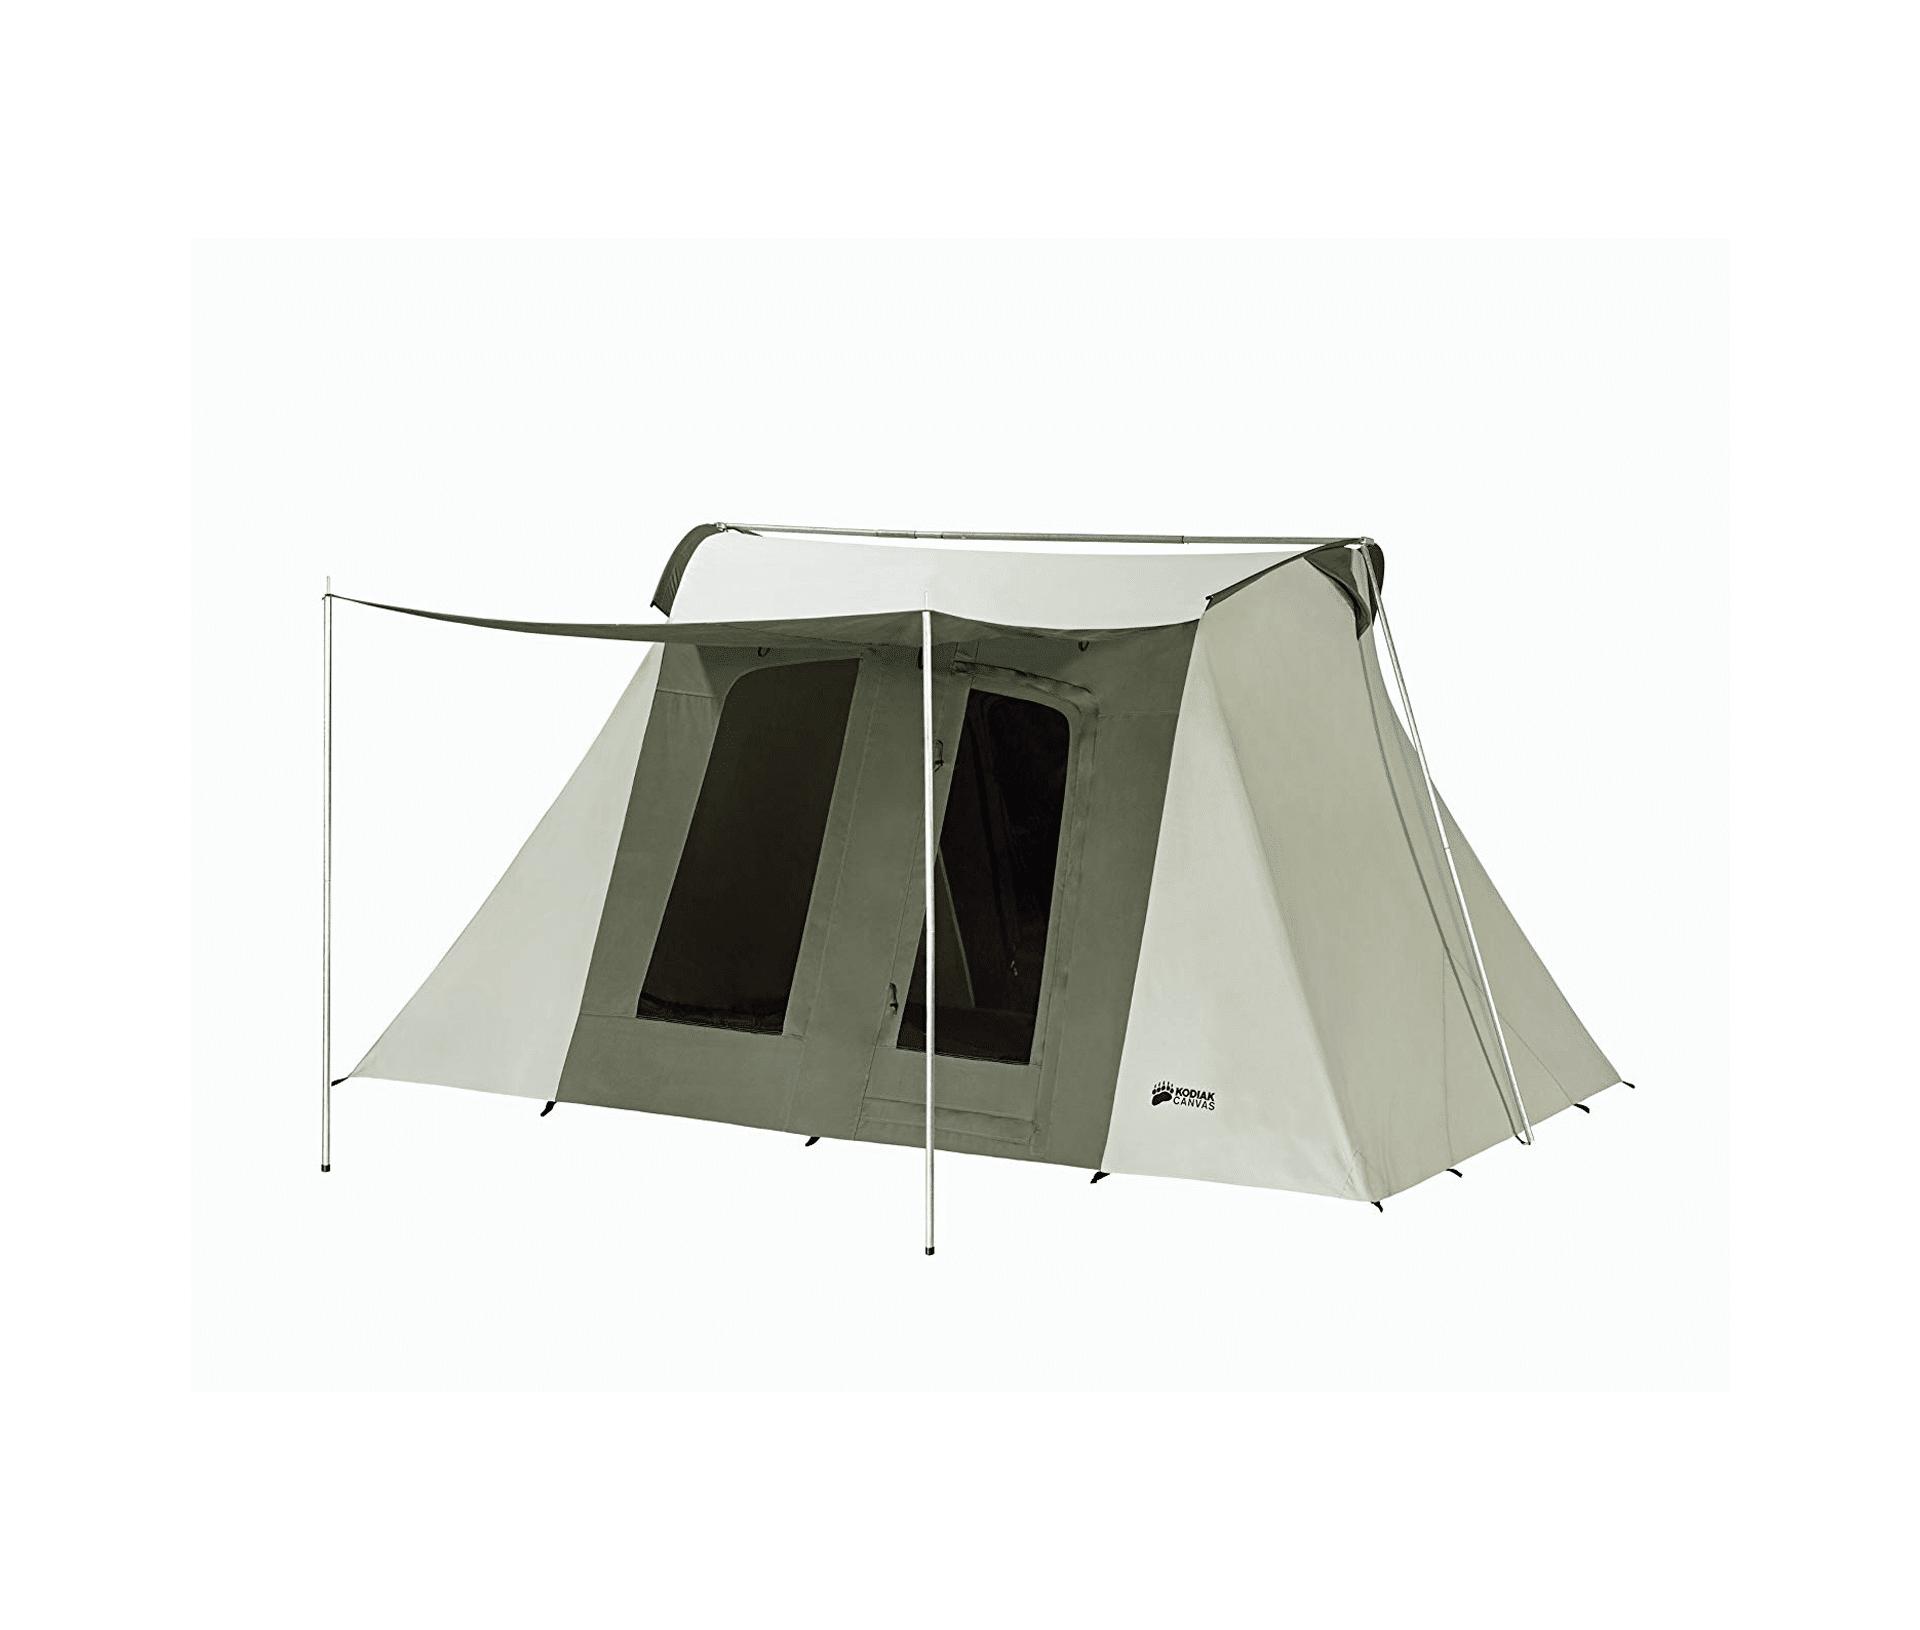 Kodiak Canvas Deluxe 8-Person Tent